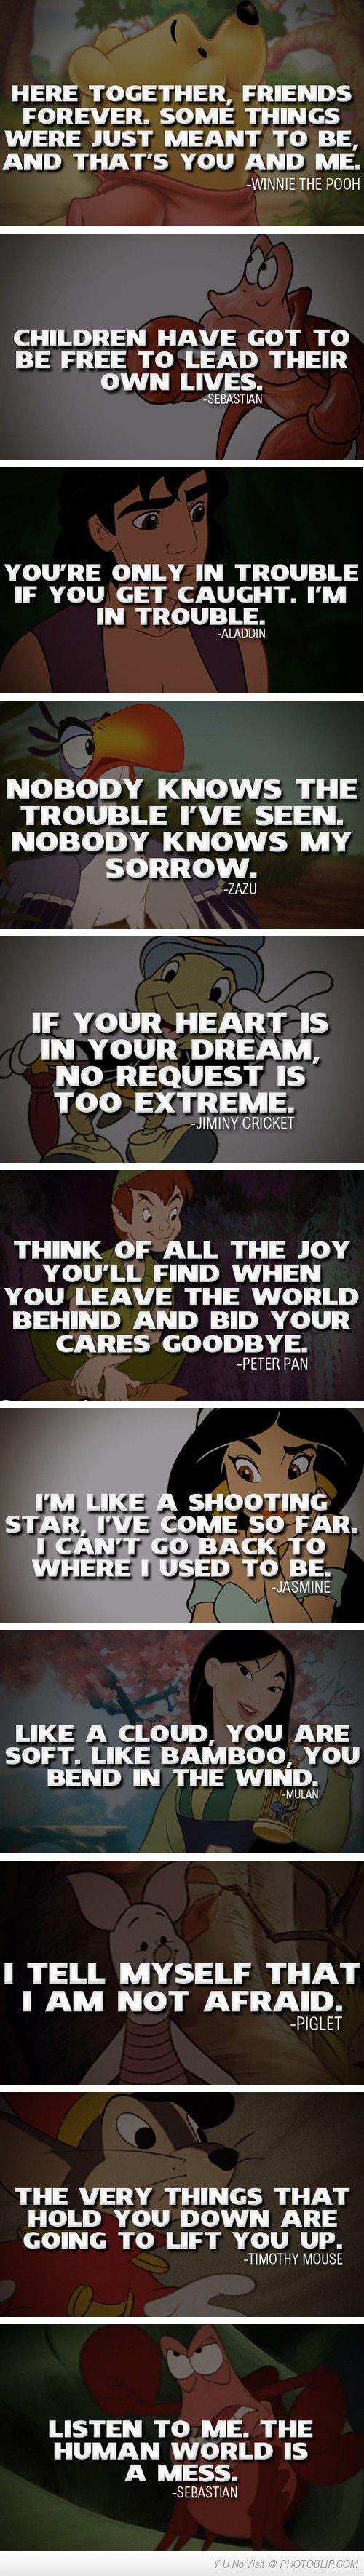 Disney Quote Compilation